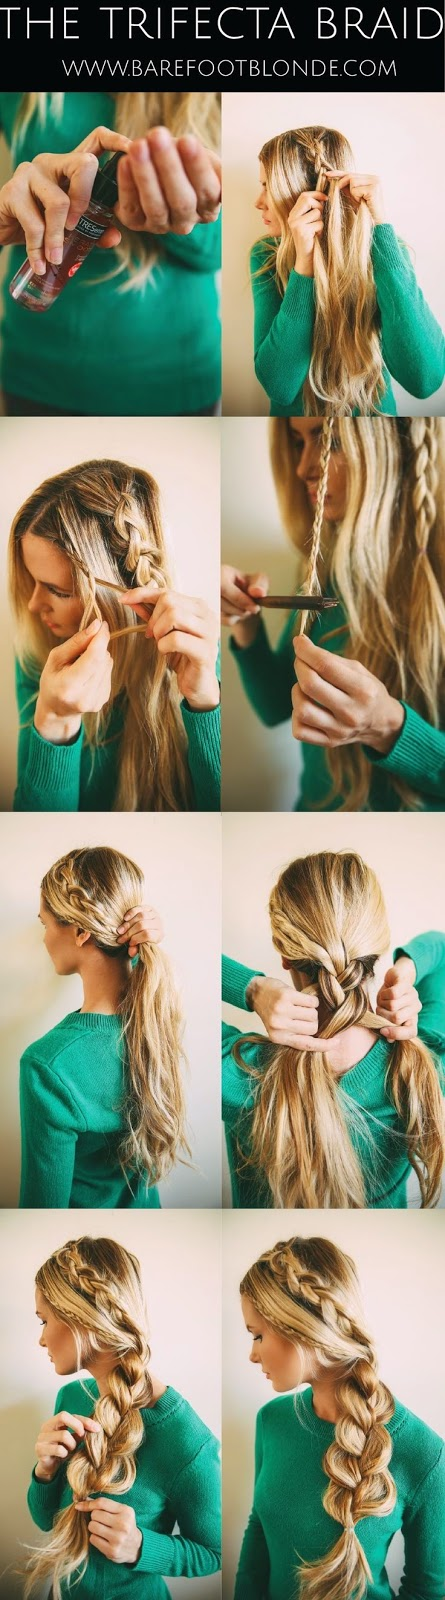 The Trifecta Braid Hairstyle Tutorial For Long Hair Toronto